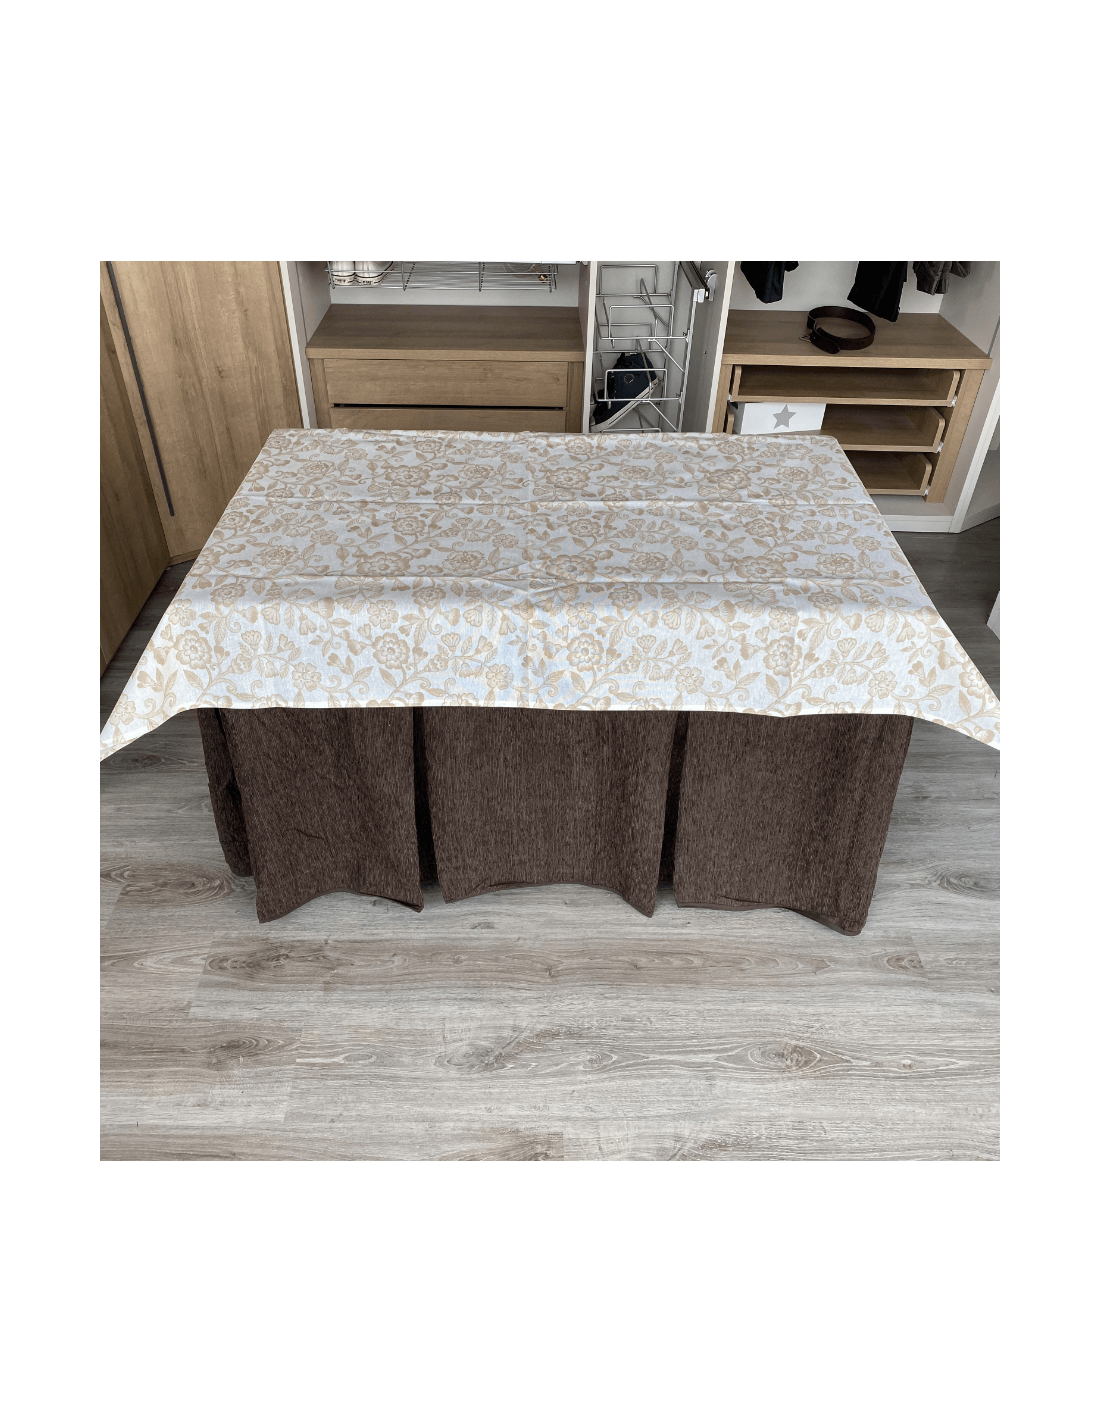 Estantería de madera con 5 estantes